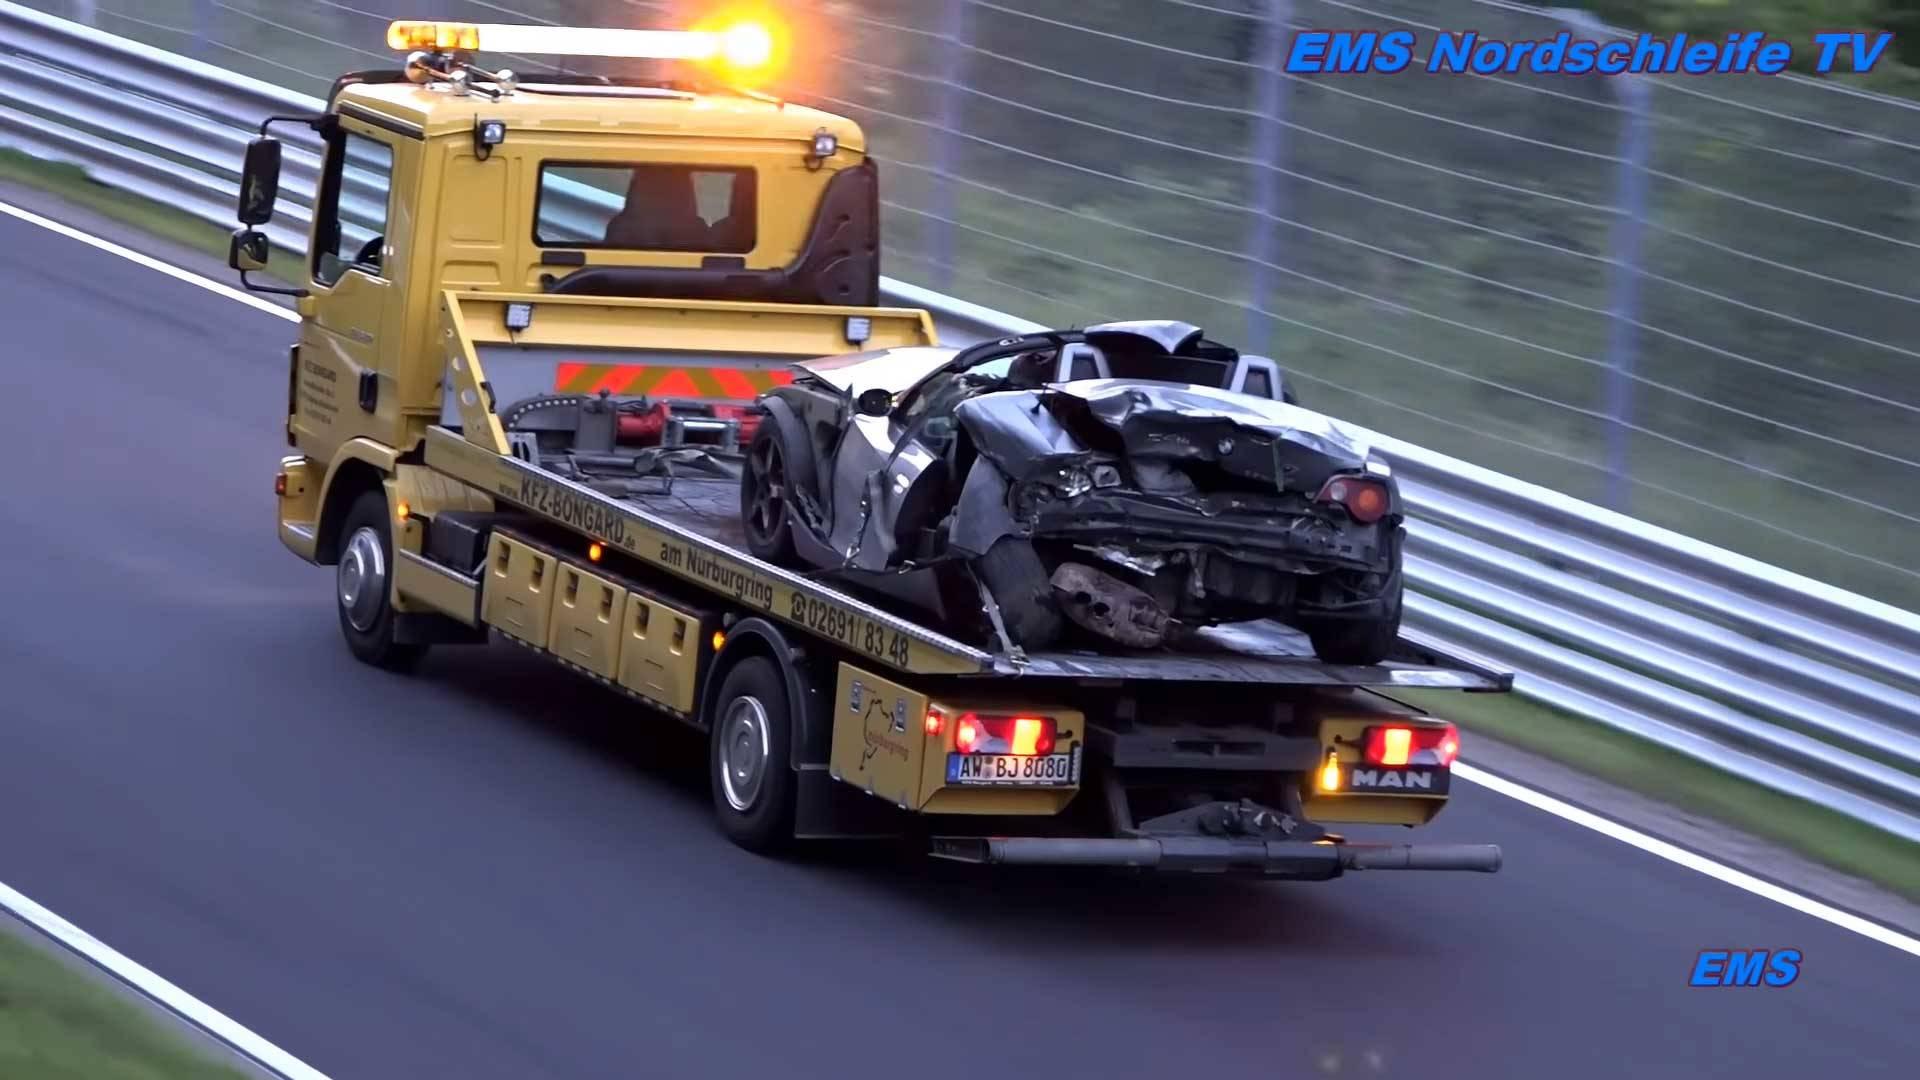 Photo of Τι καλό… σαβούριασε ένας γερανός στο Nürburgring; [vid]